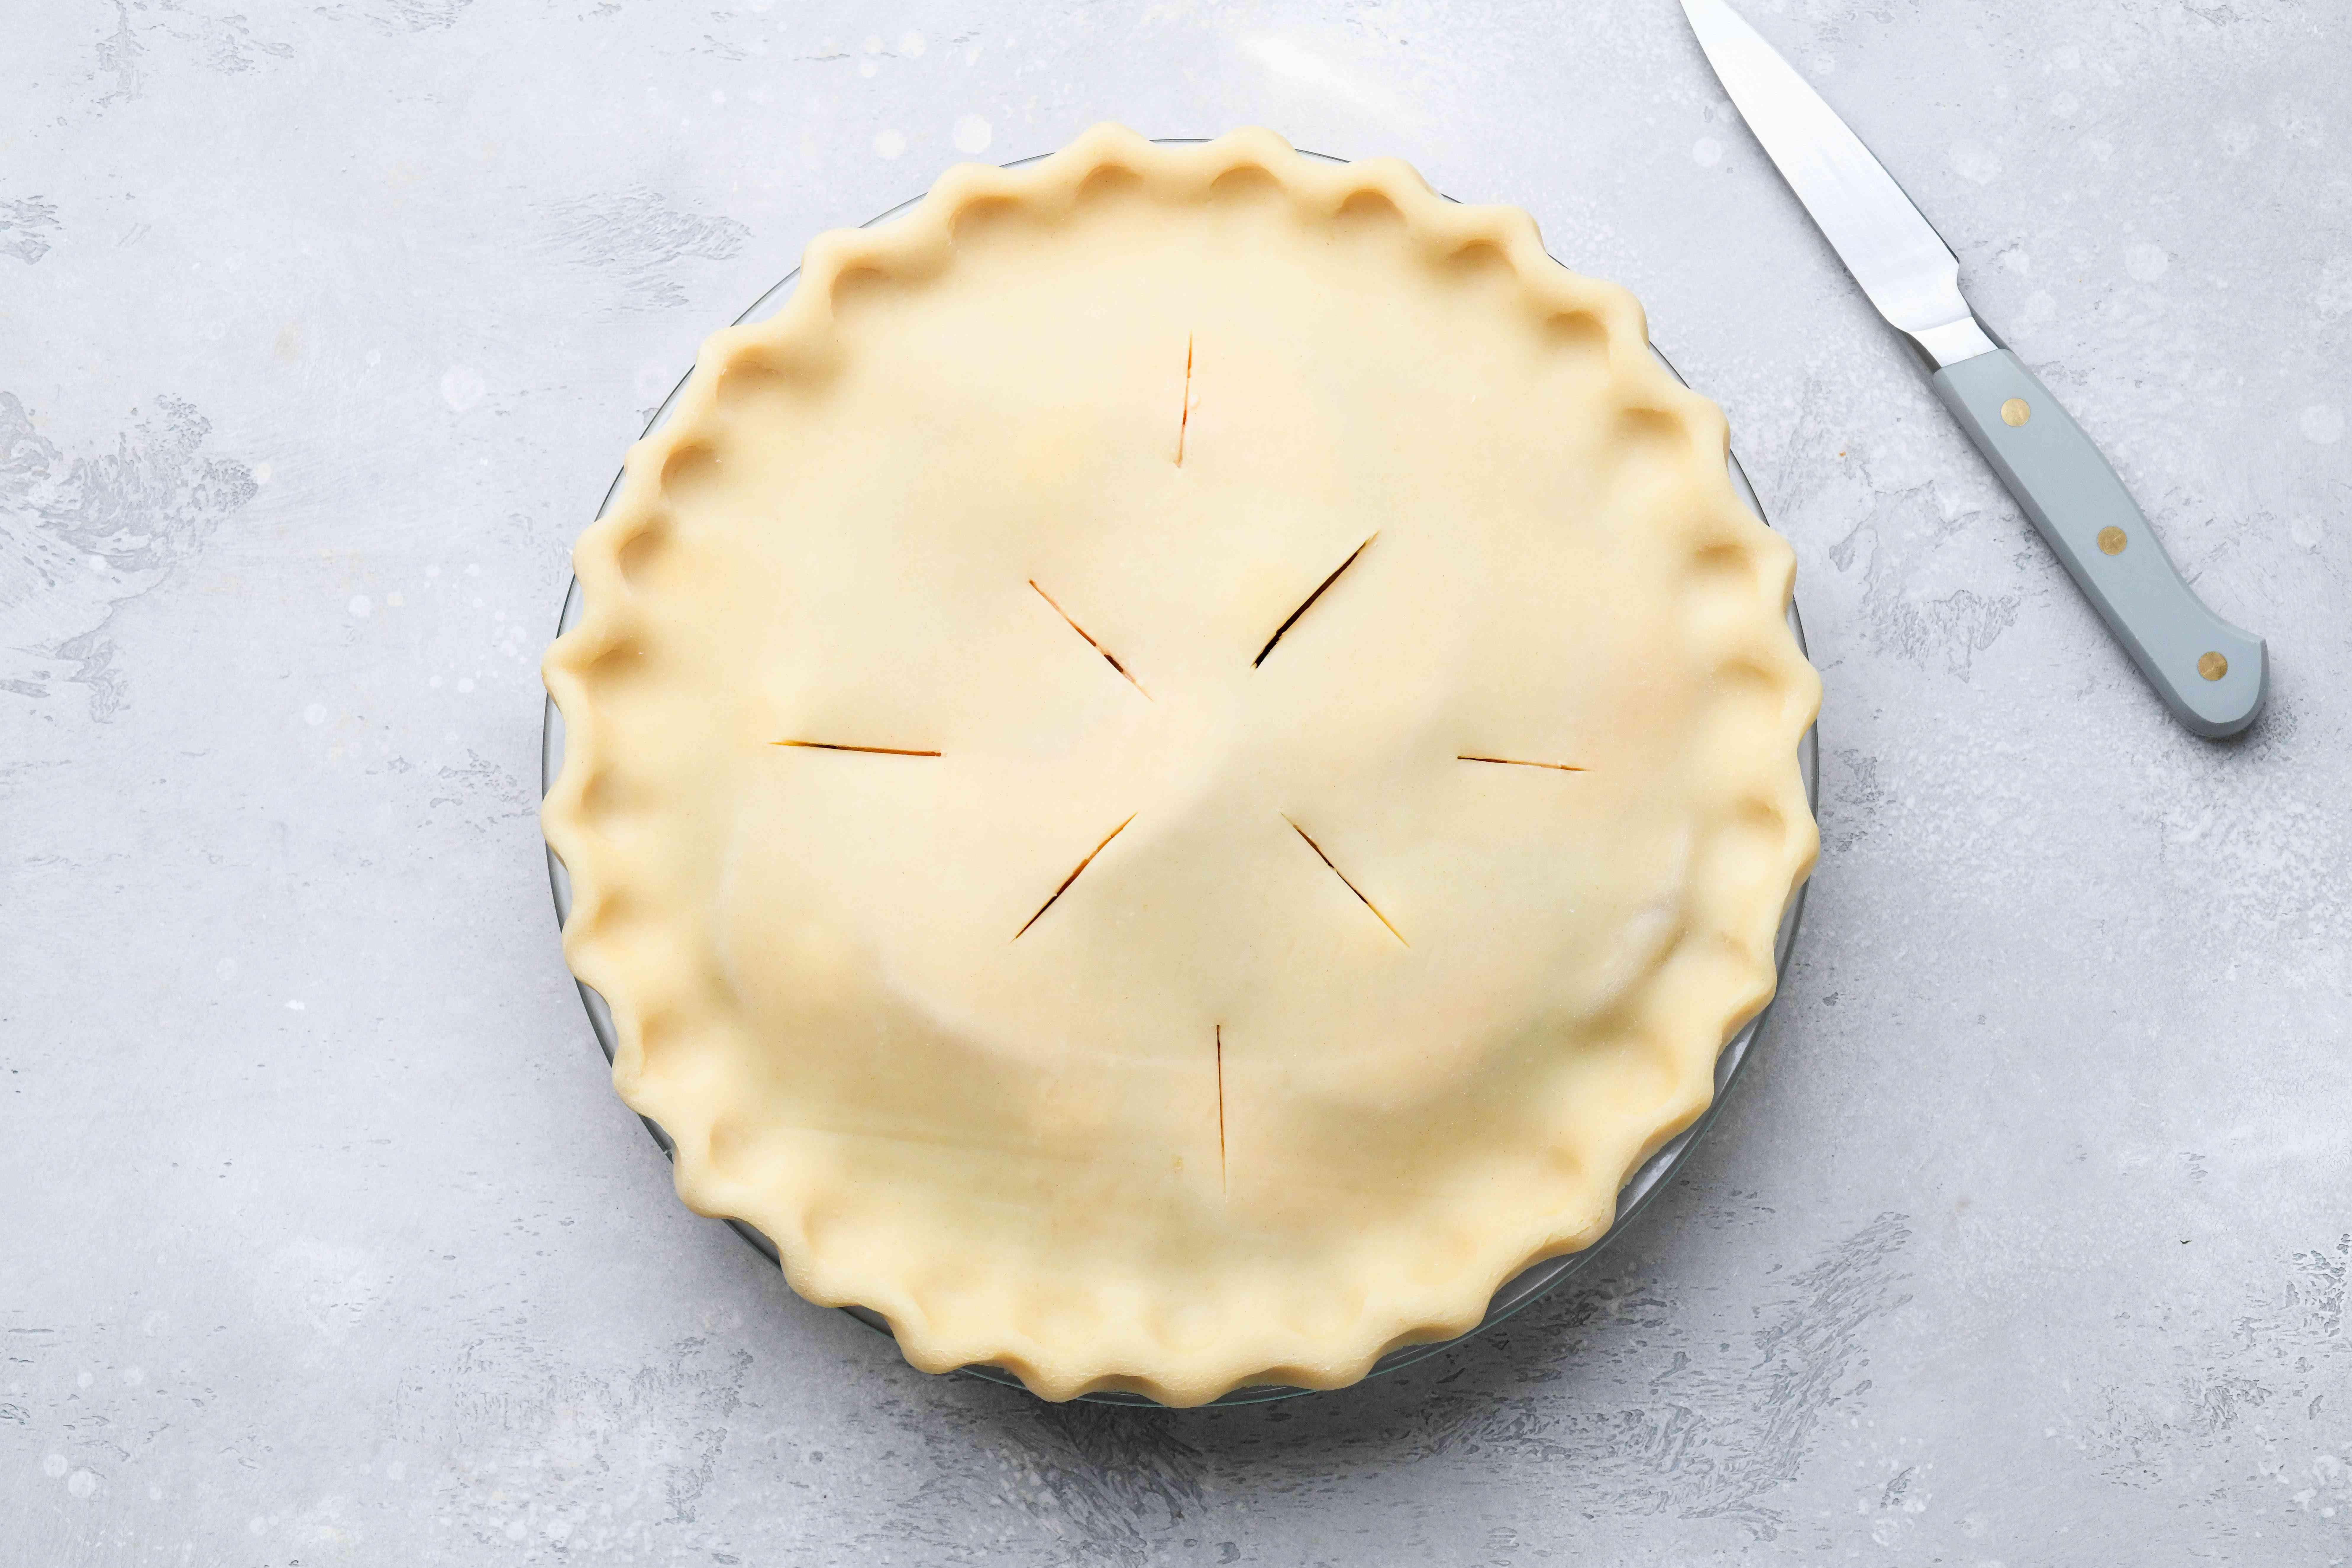 pie crust on top of the peach pie